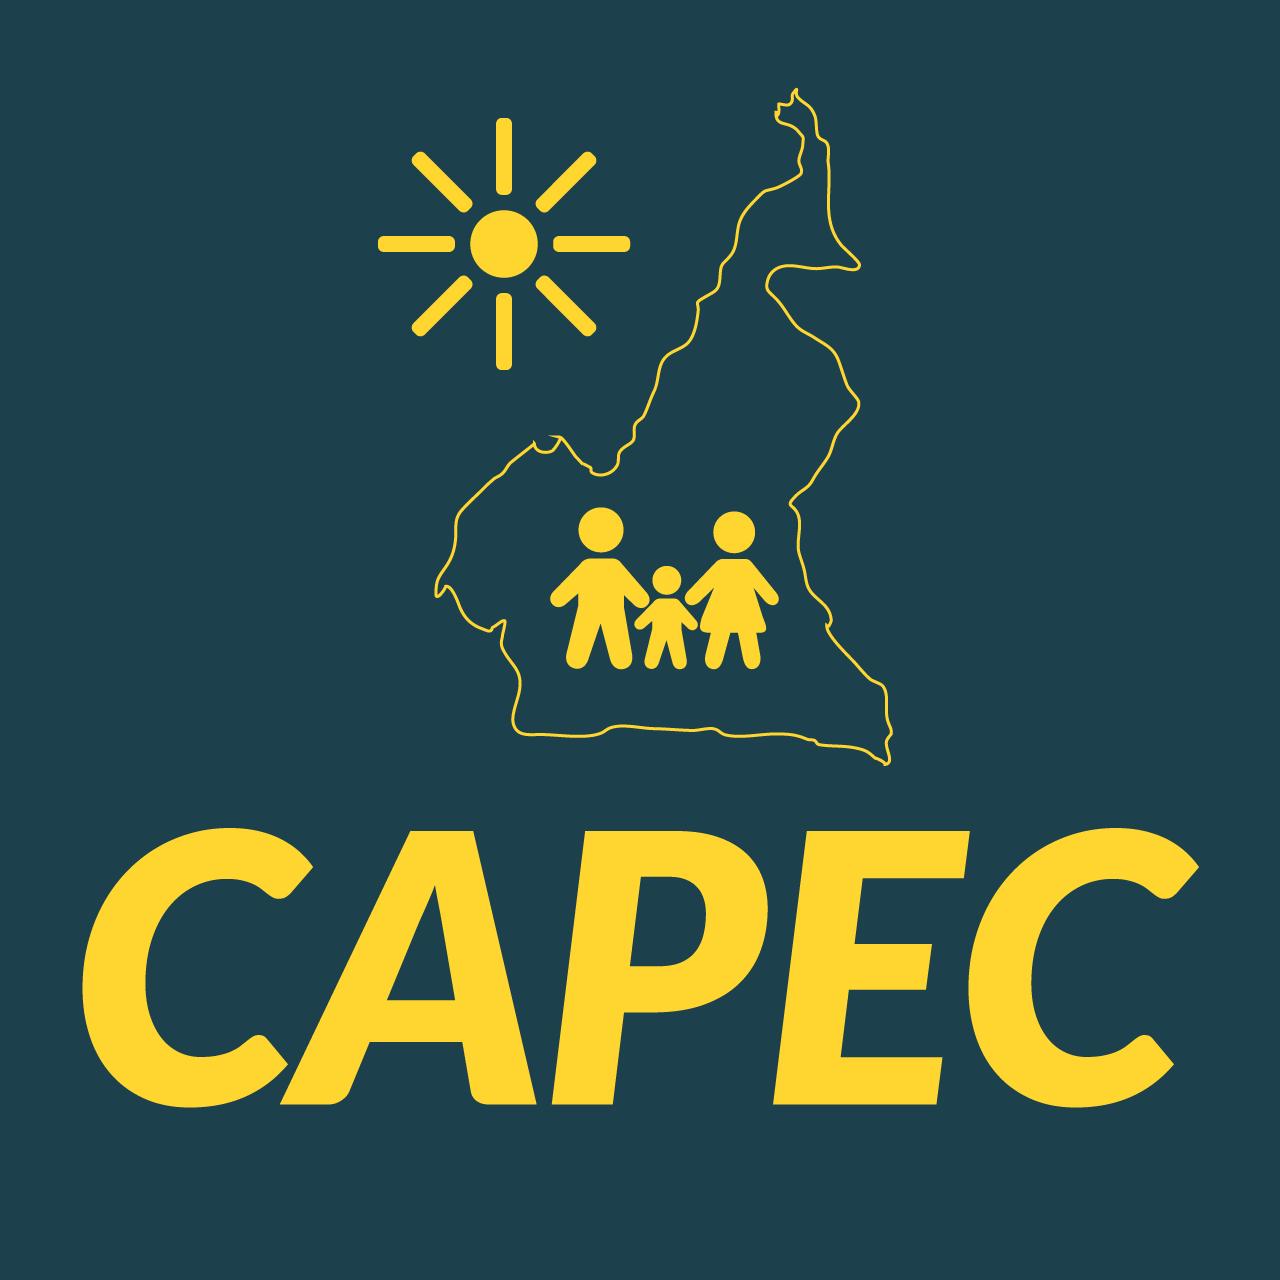 Capec Camerooun